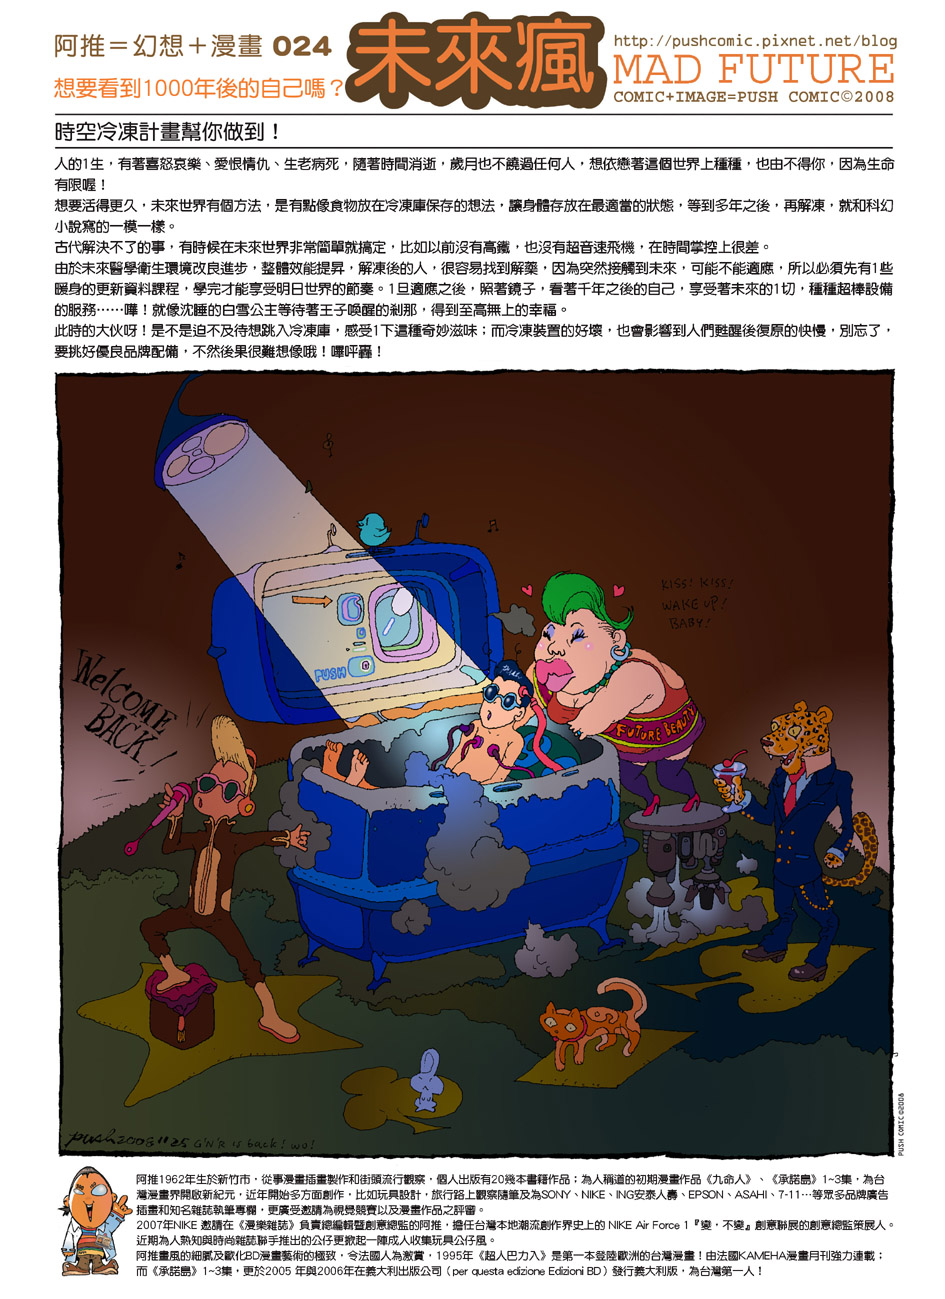 Ming-024-MF-byPUSH-S.jpg